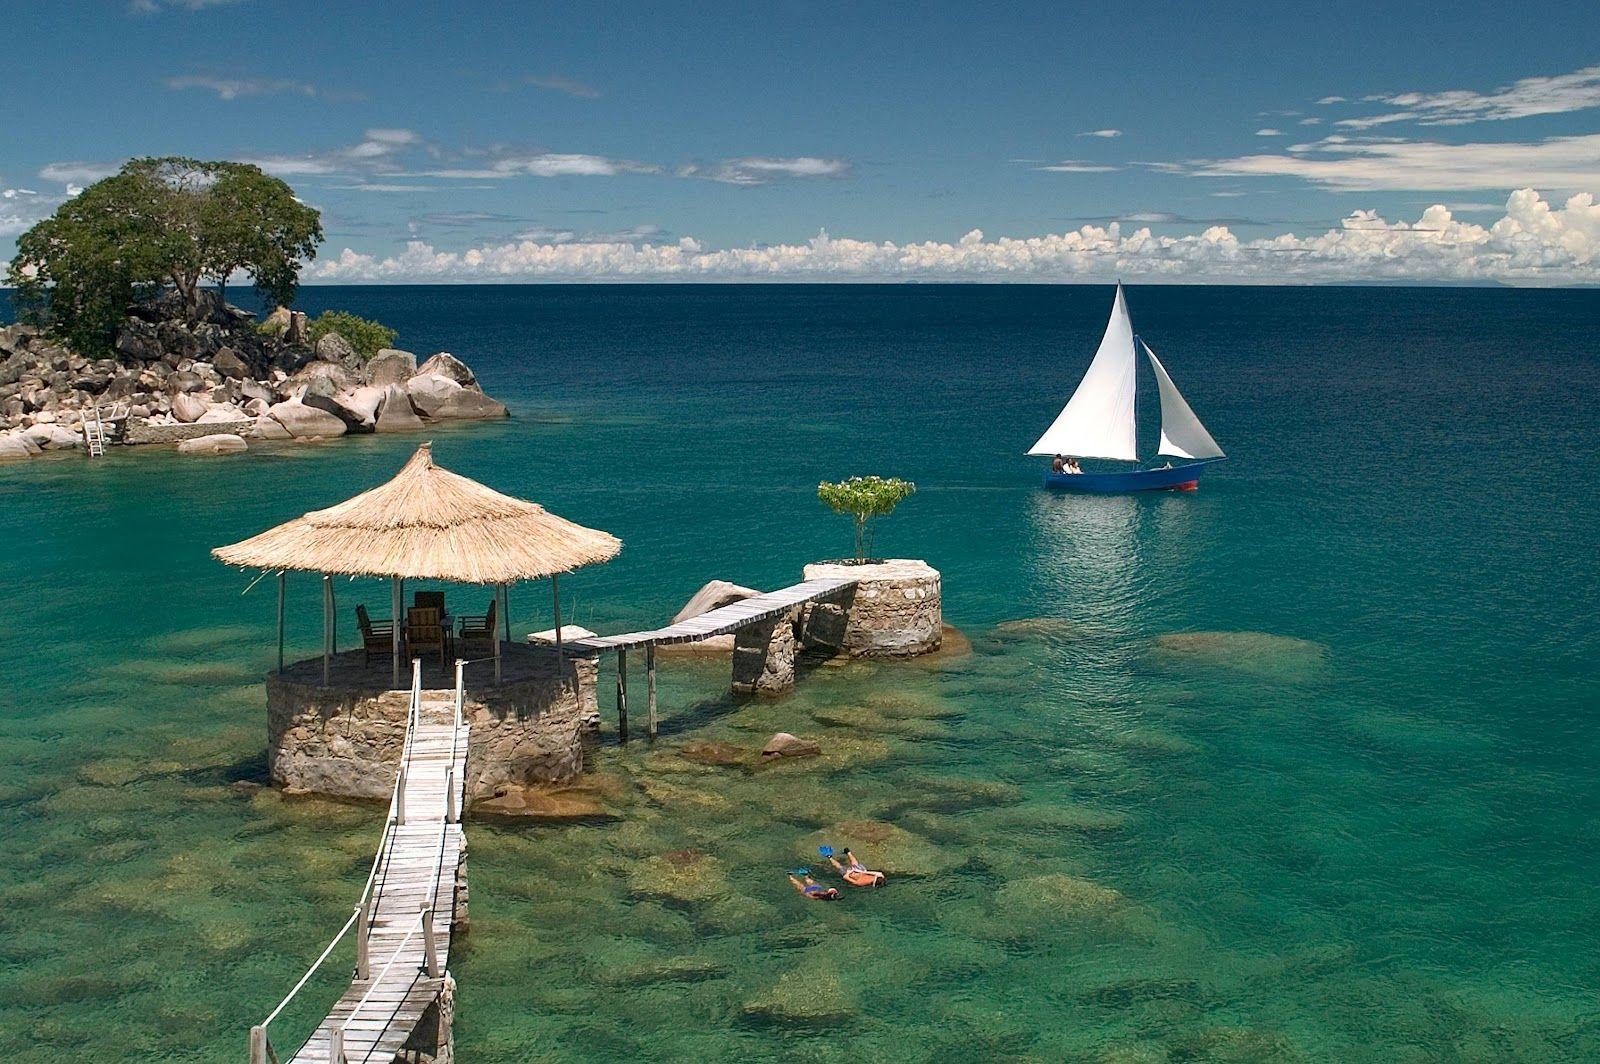 Malawi 7QNL Lake Malawi Tourist Attractions